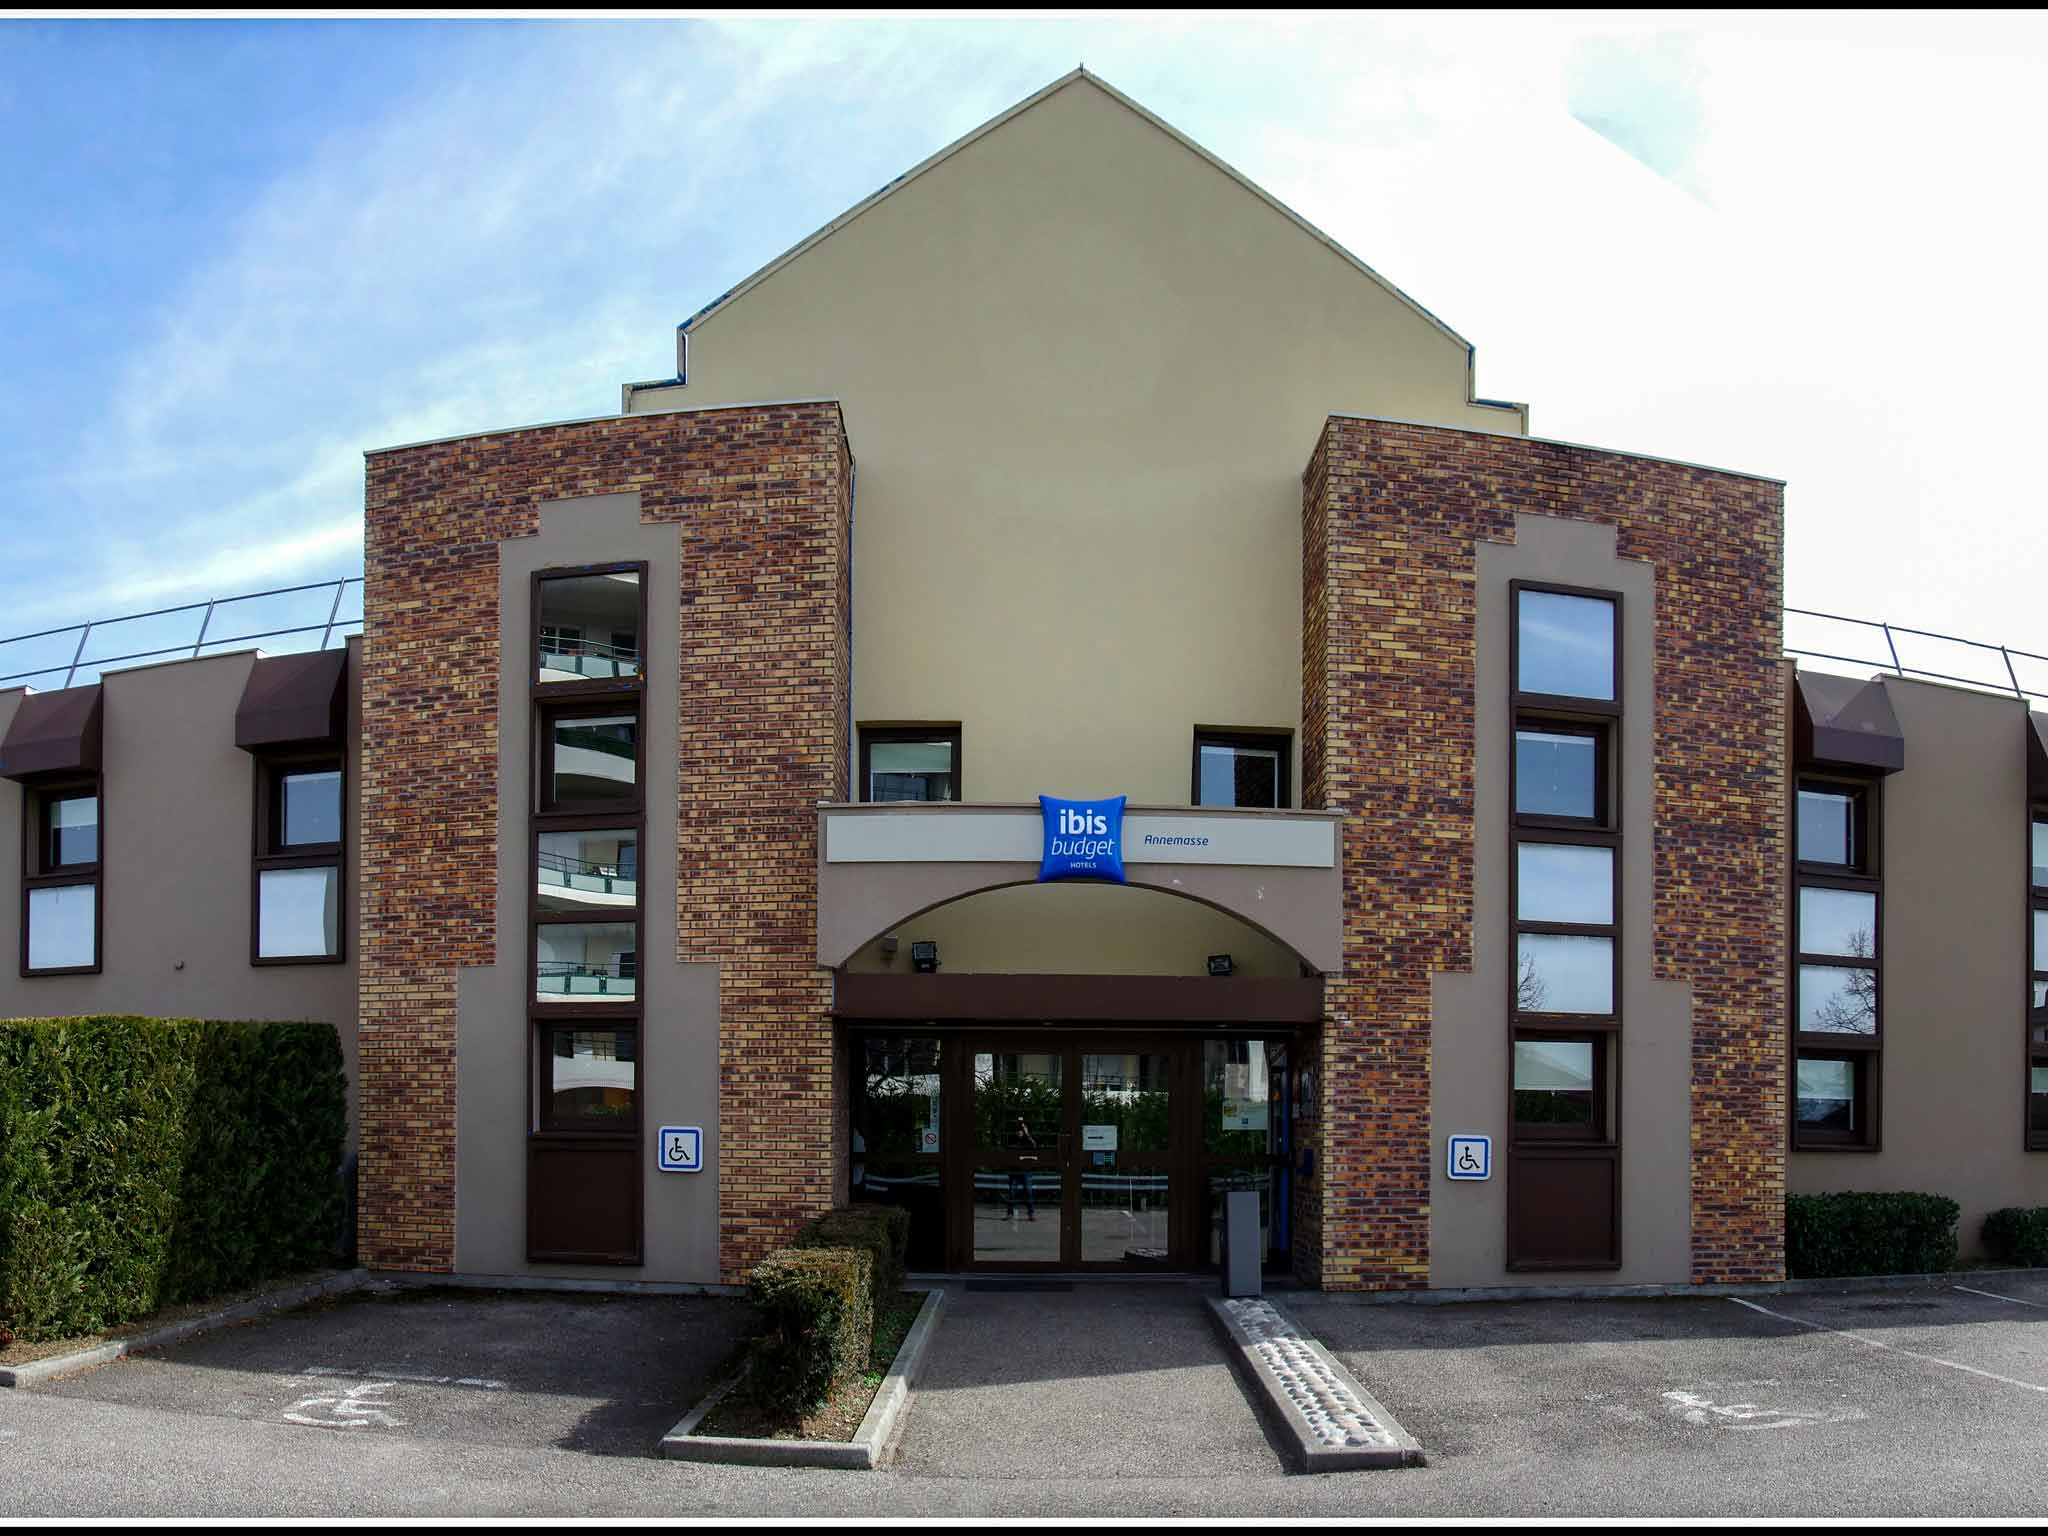 Hotel Ibis Buget